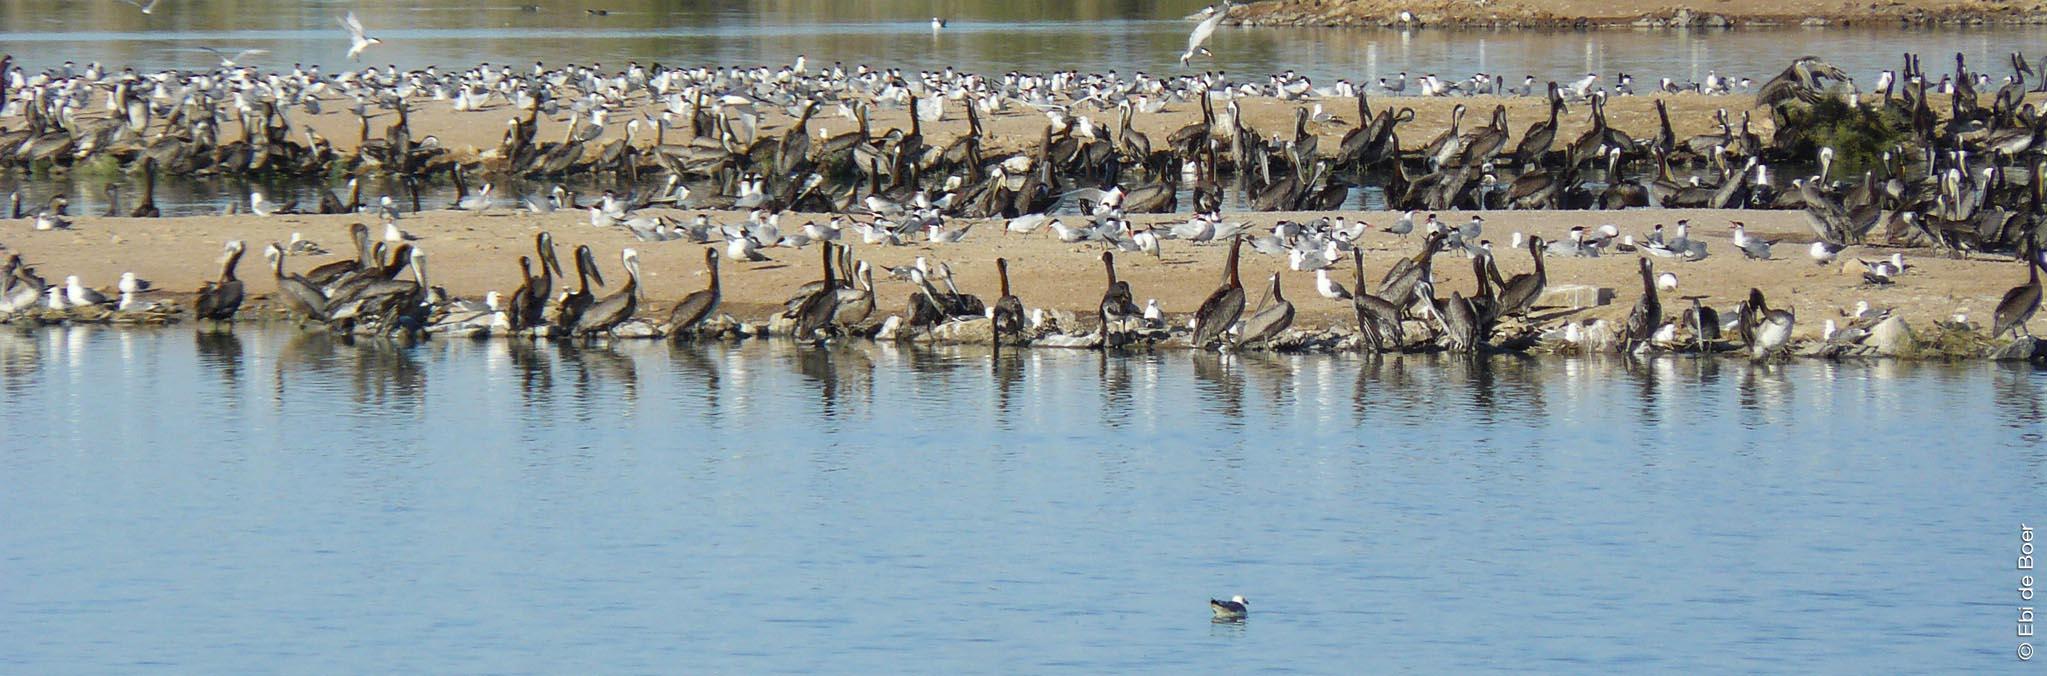 ©Ebi-de-Boer-Kalifornien-birdwatching-photographie